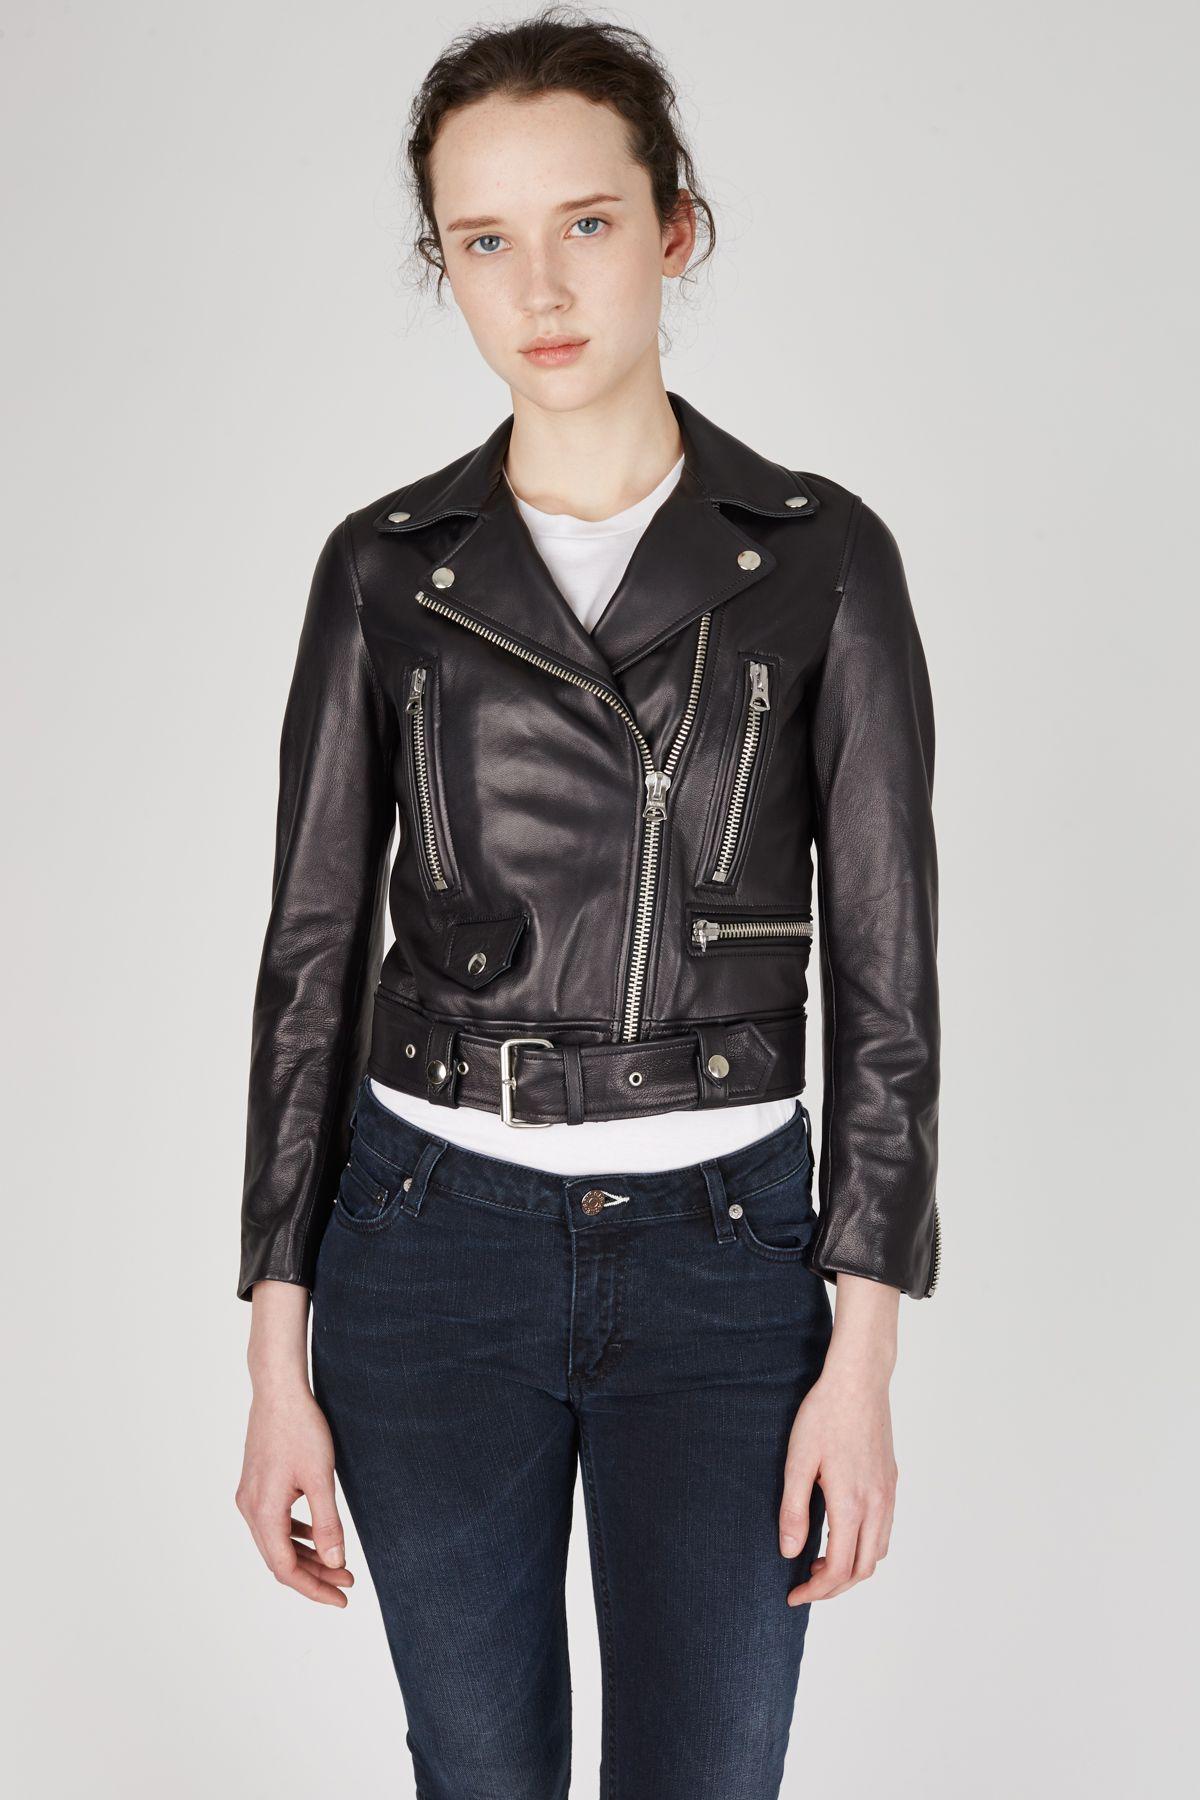 Acne Studios Mock Leather Motorcycle Jacket WOMEN Acne